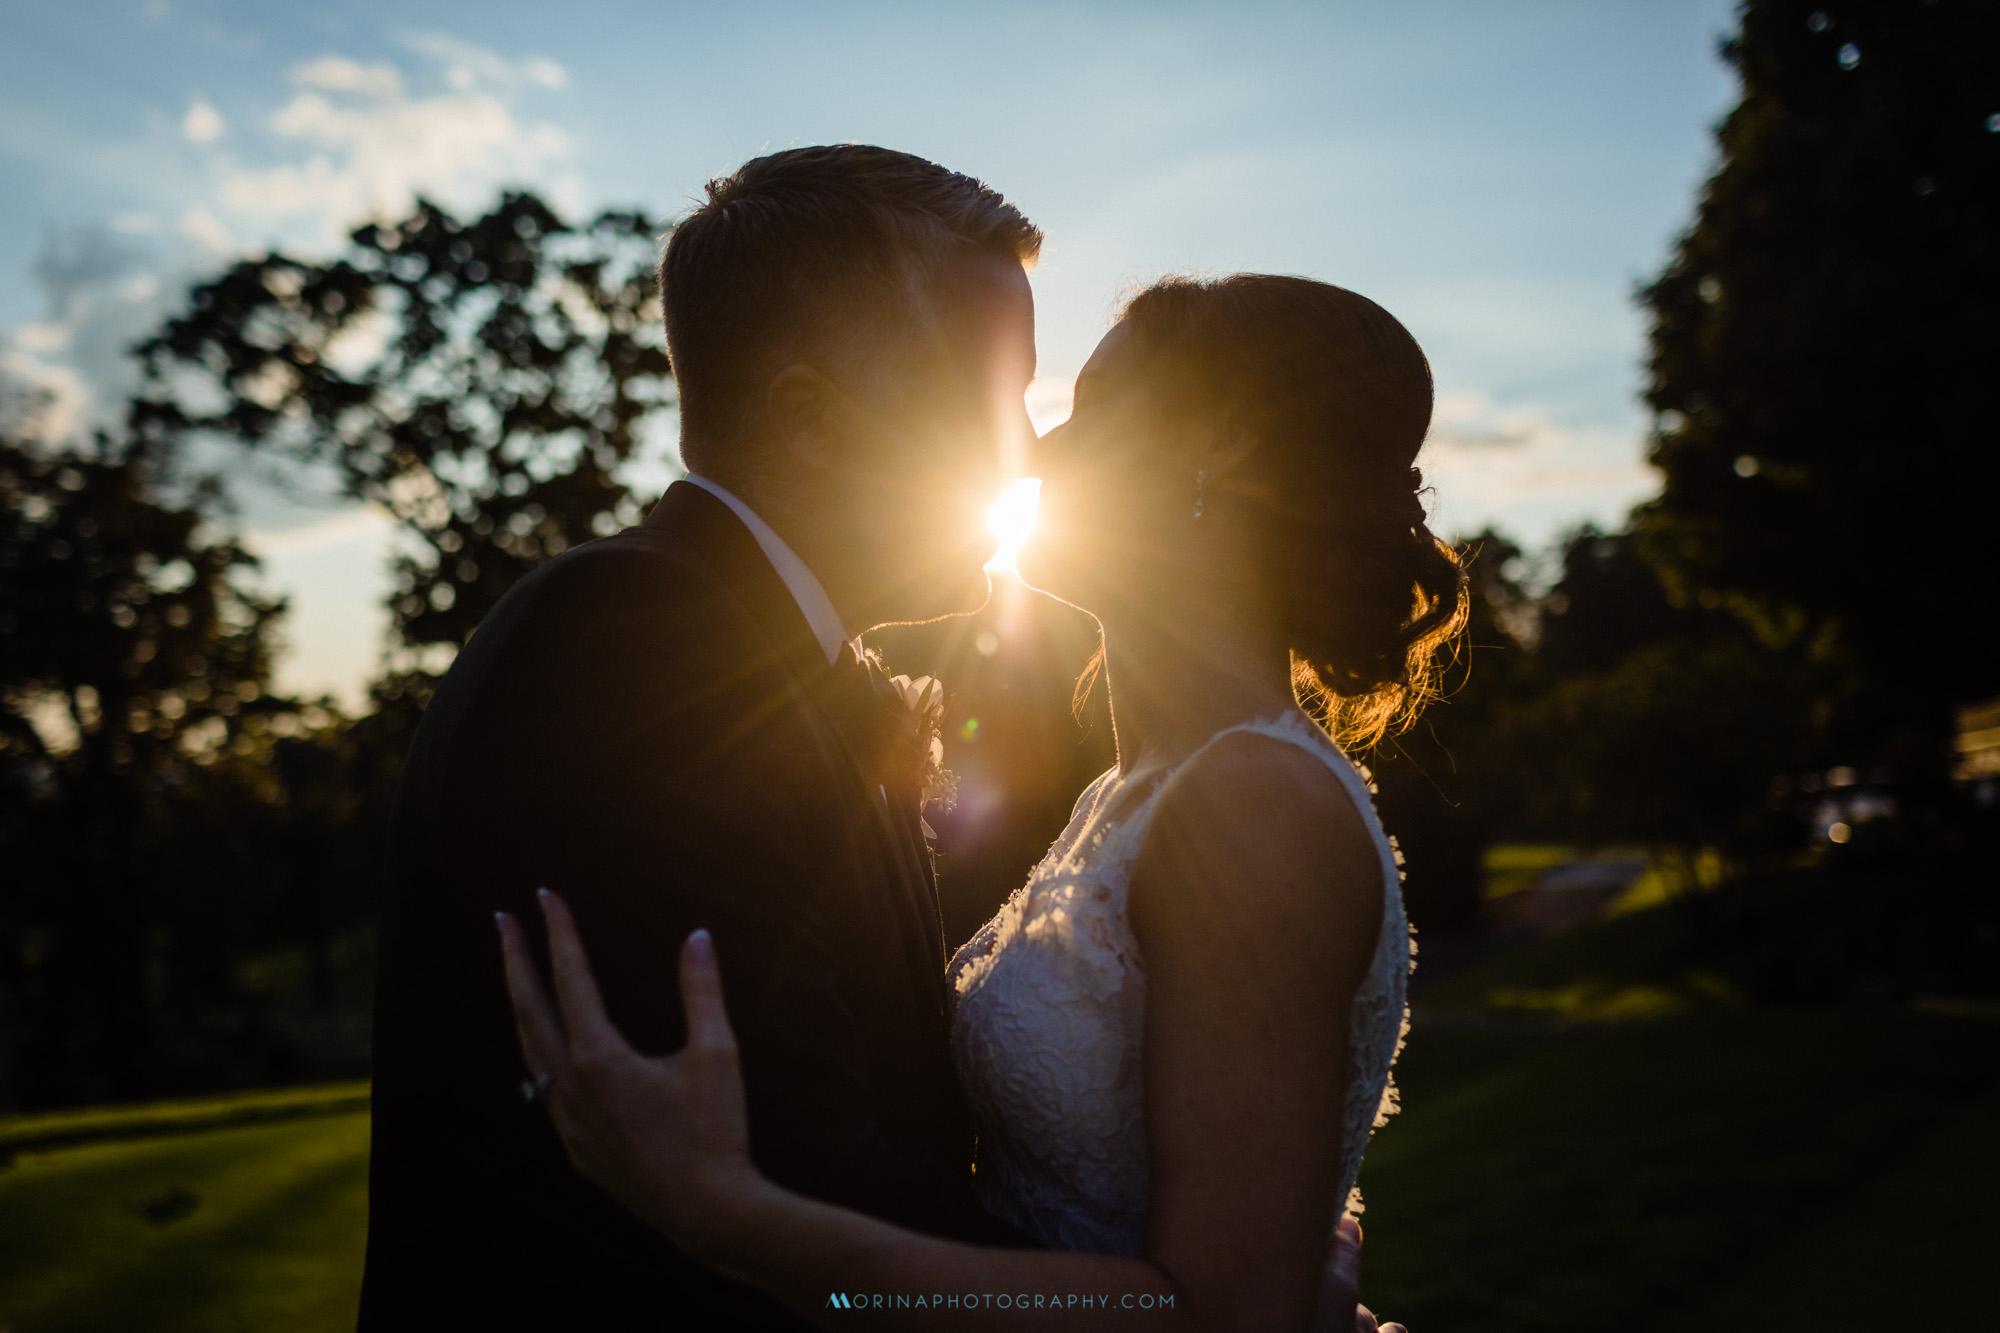 Colleen & Bill Wedding at Manufacturers' Golf & Country Club wedding 0062.jpg